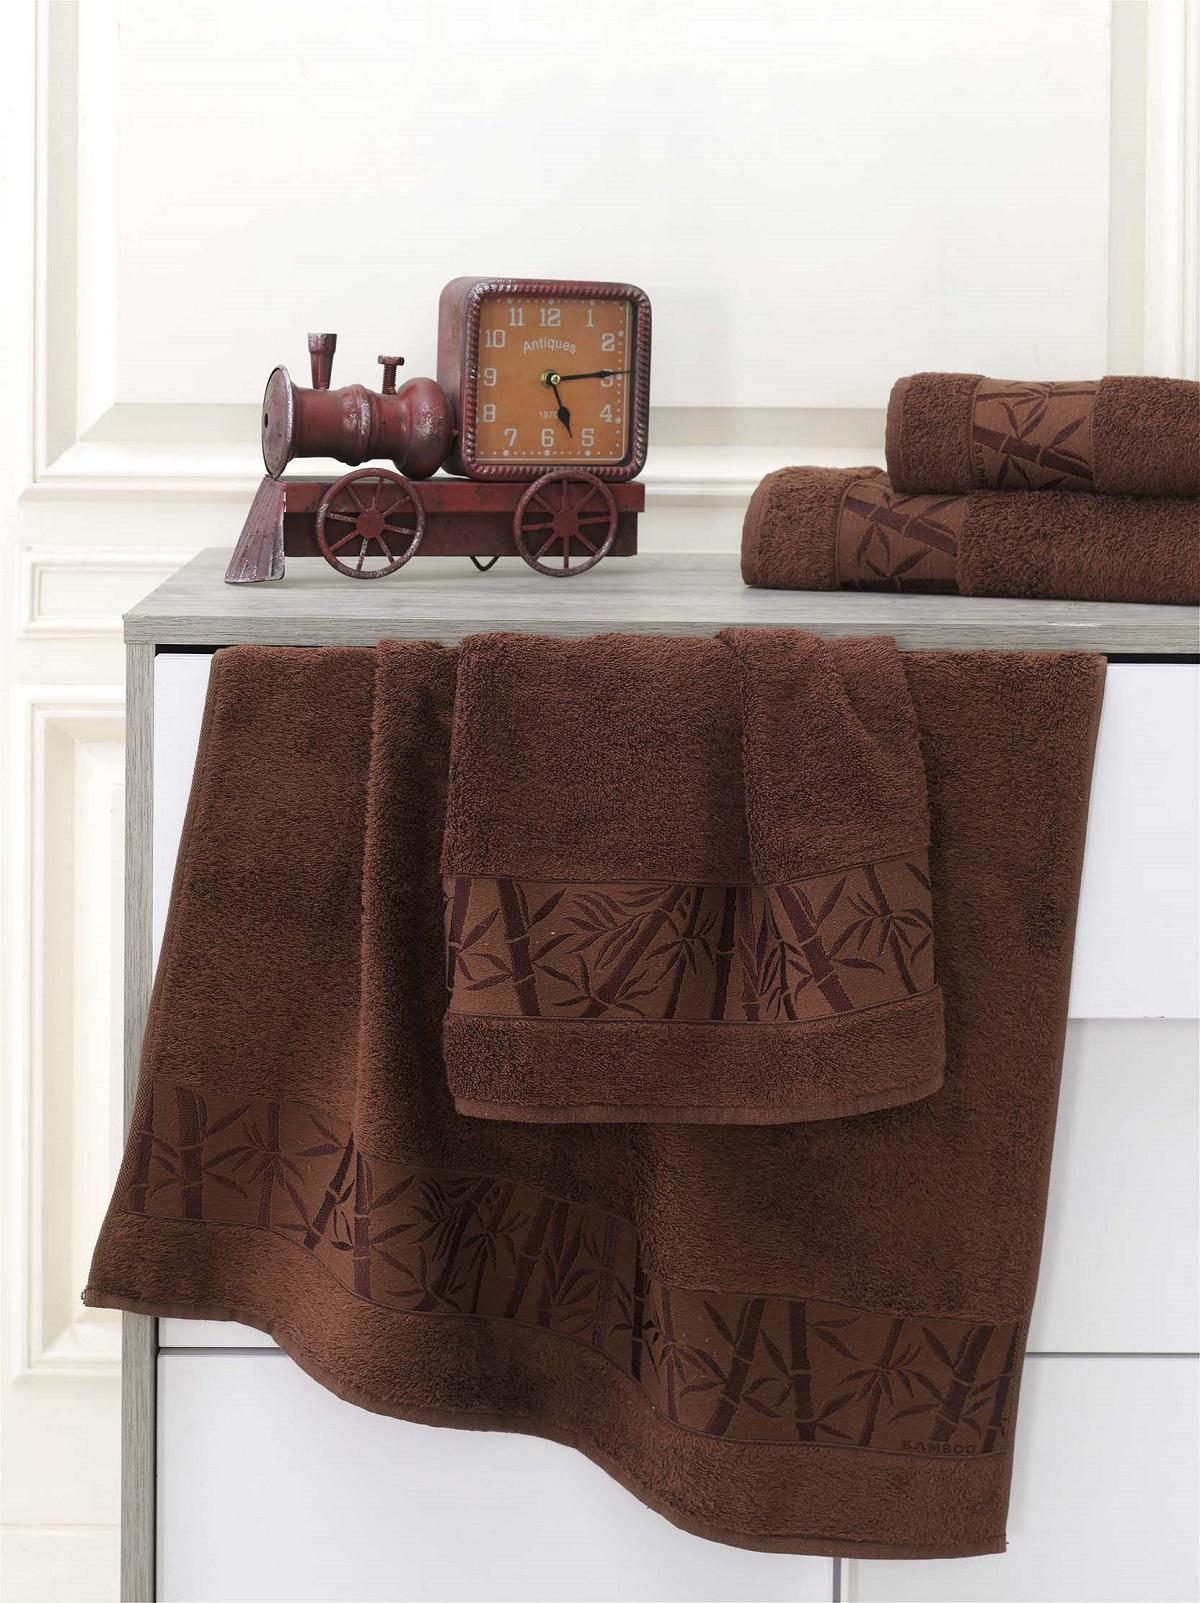 Полотенца Karna Полотенце Pamira Цвет: Коричневый (70х140 см) полотенца karna полотенце iteka цвет коричневый 70х140 см